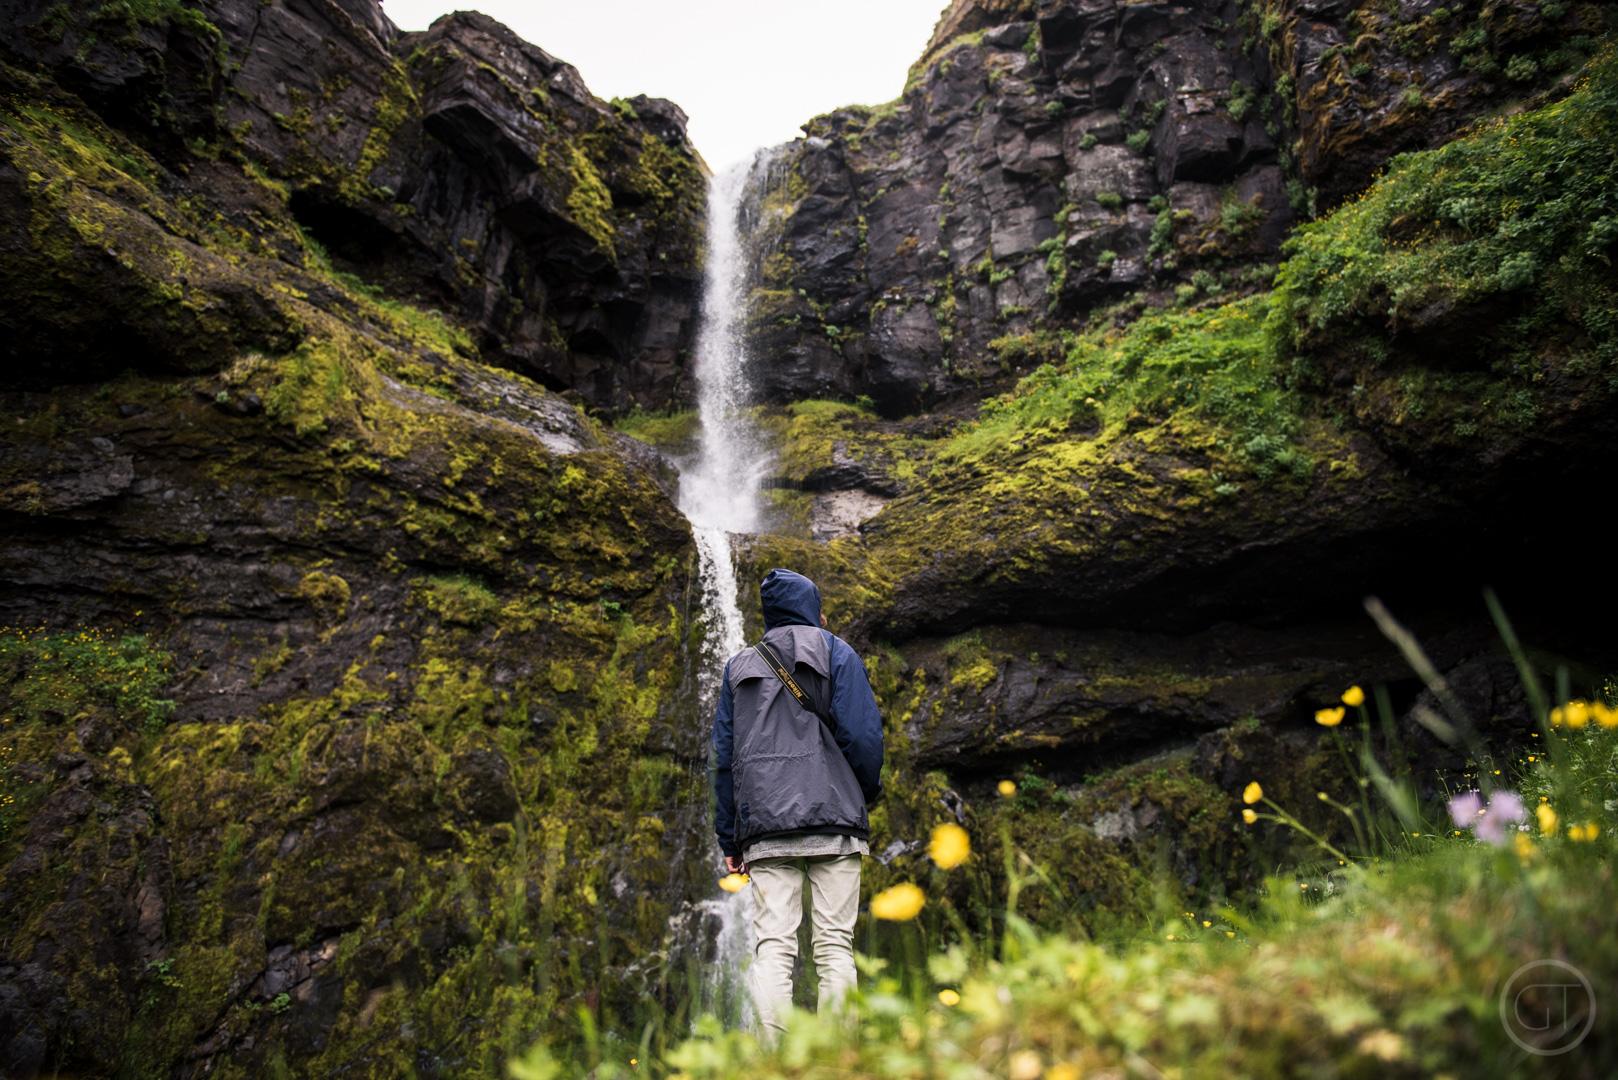 Iceland-gustav-thuesen-photography-landscape-nature-københavn-danmark-adventure-outdoor-lifestyle-1.jpg